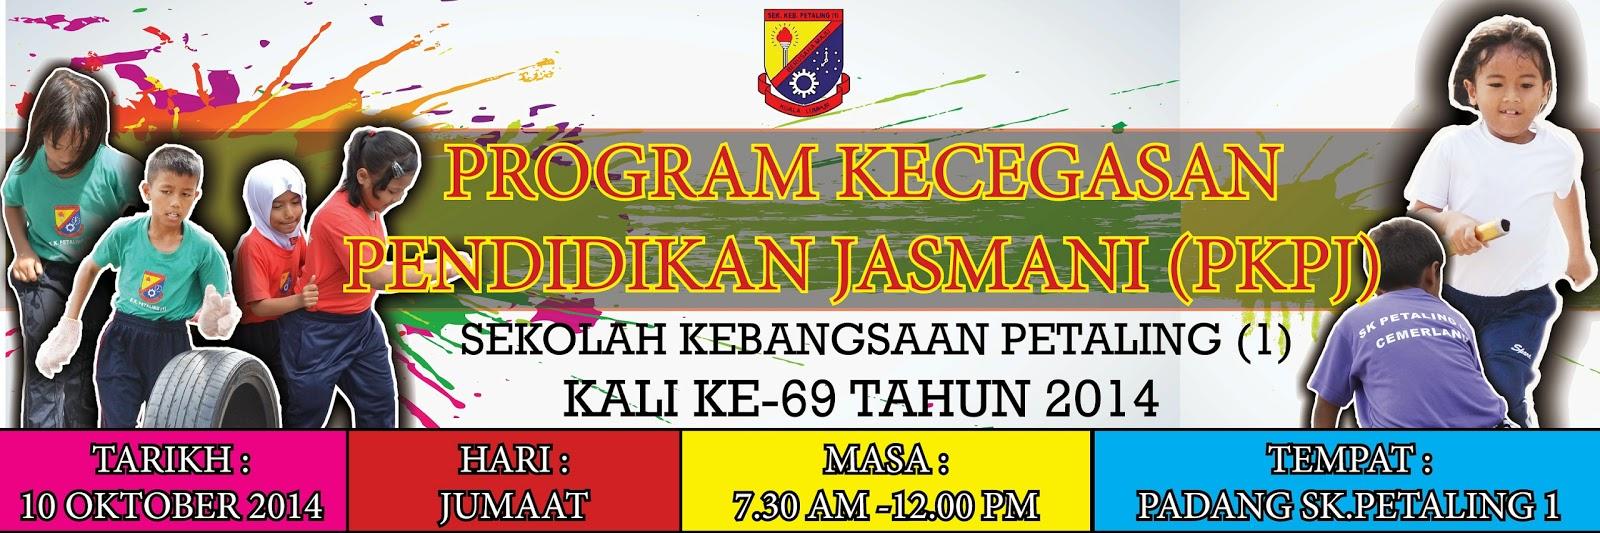 Program Kecergasan Pendidikan Jasmani 2014